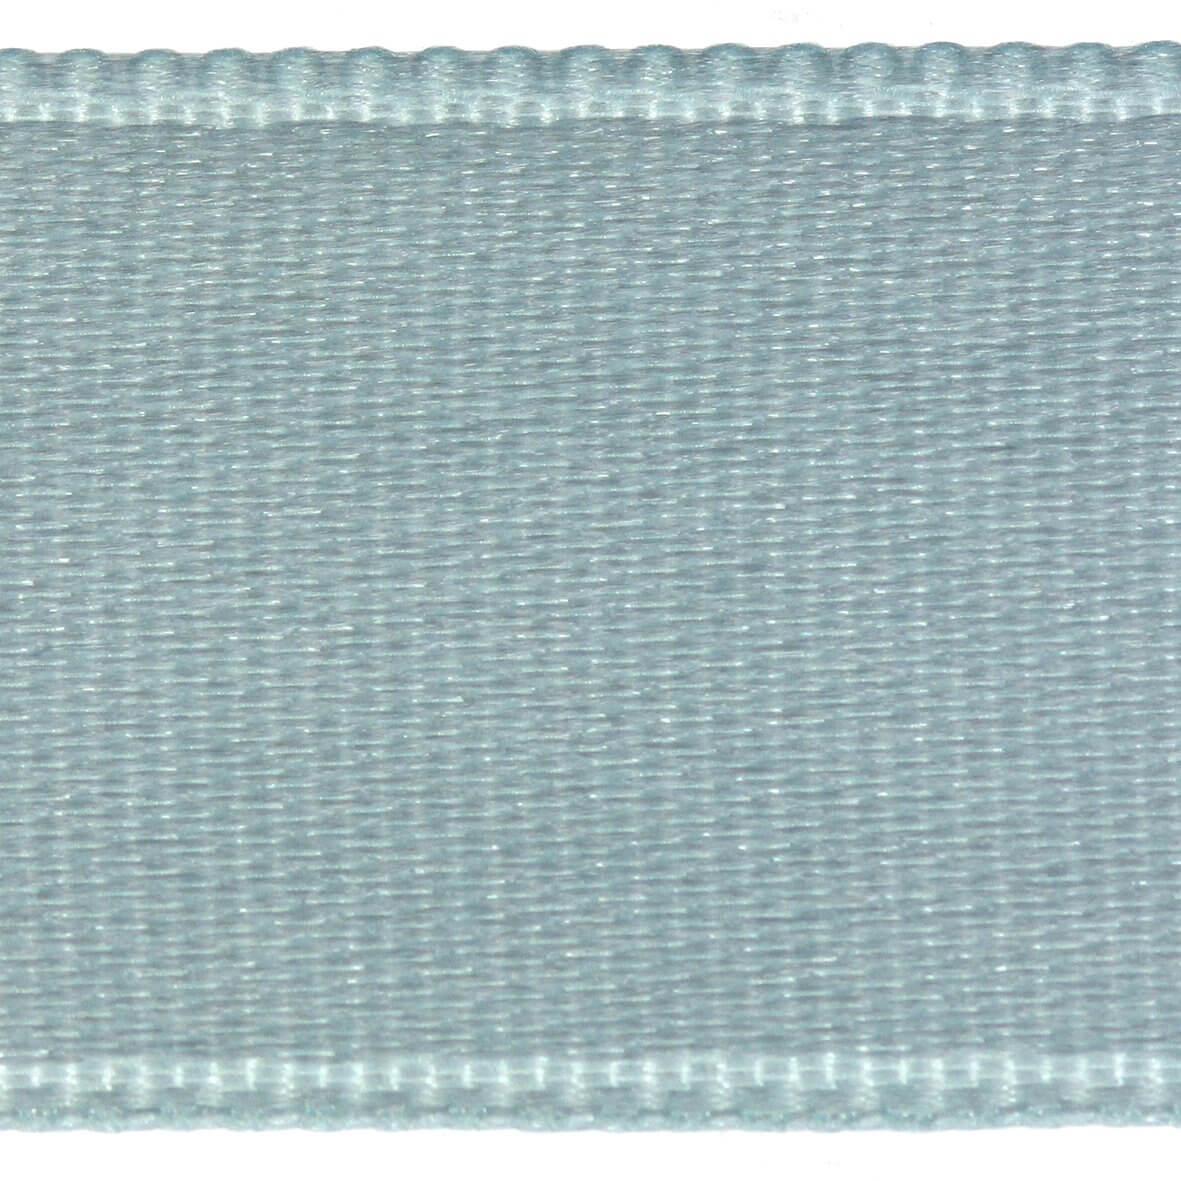 Glacier Blue Col. 405 - 3mm Satab Satin Ribbon